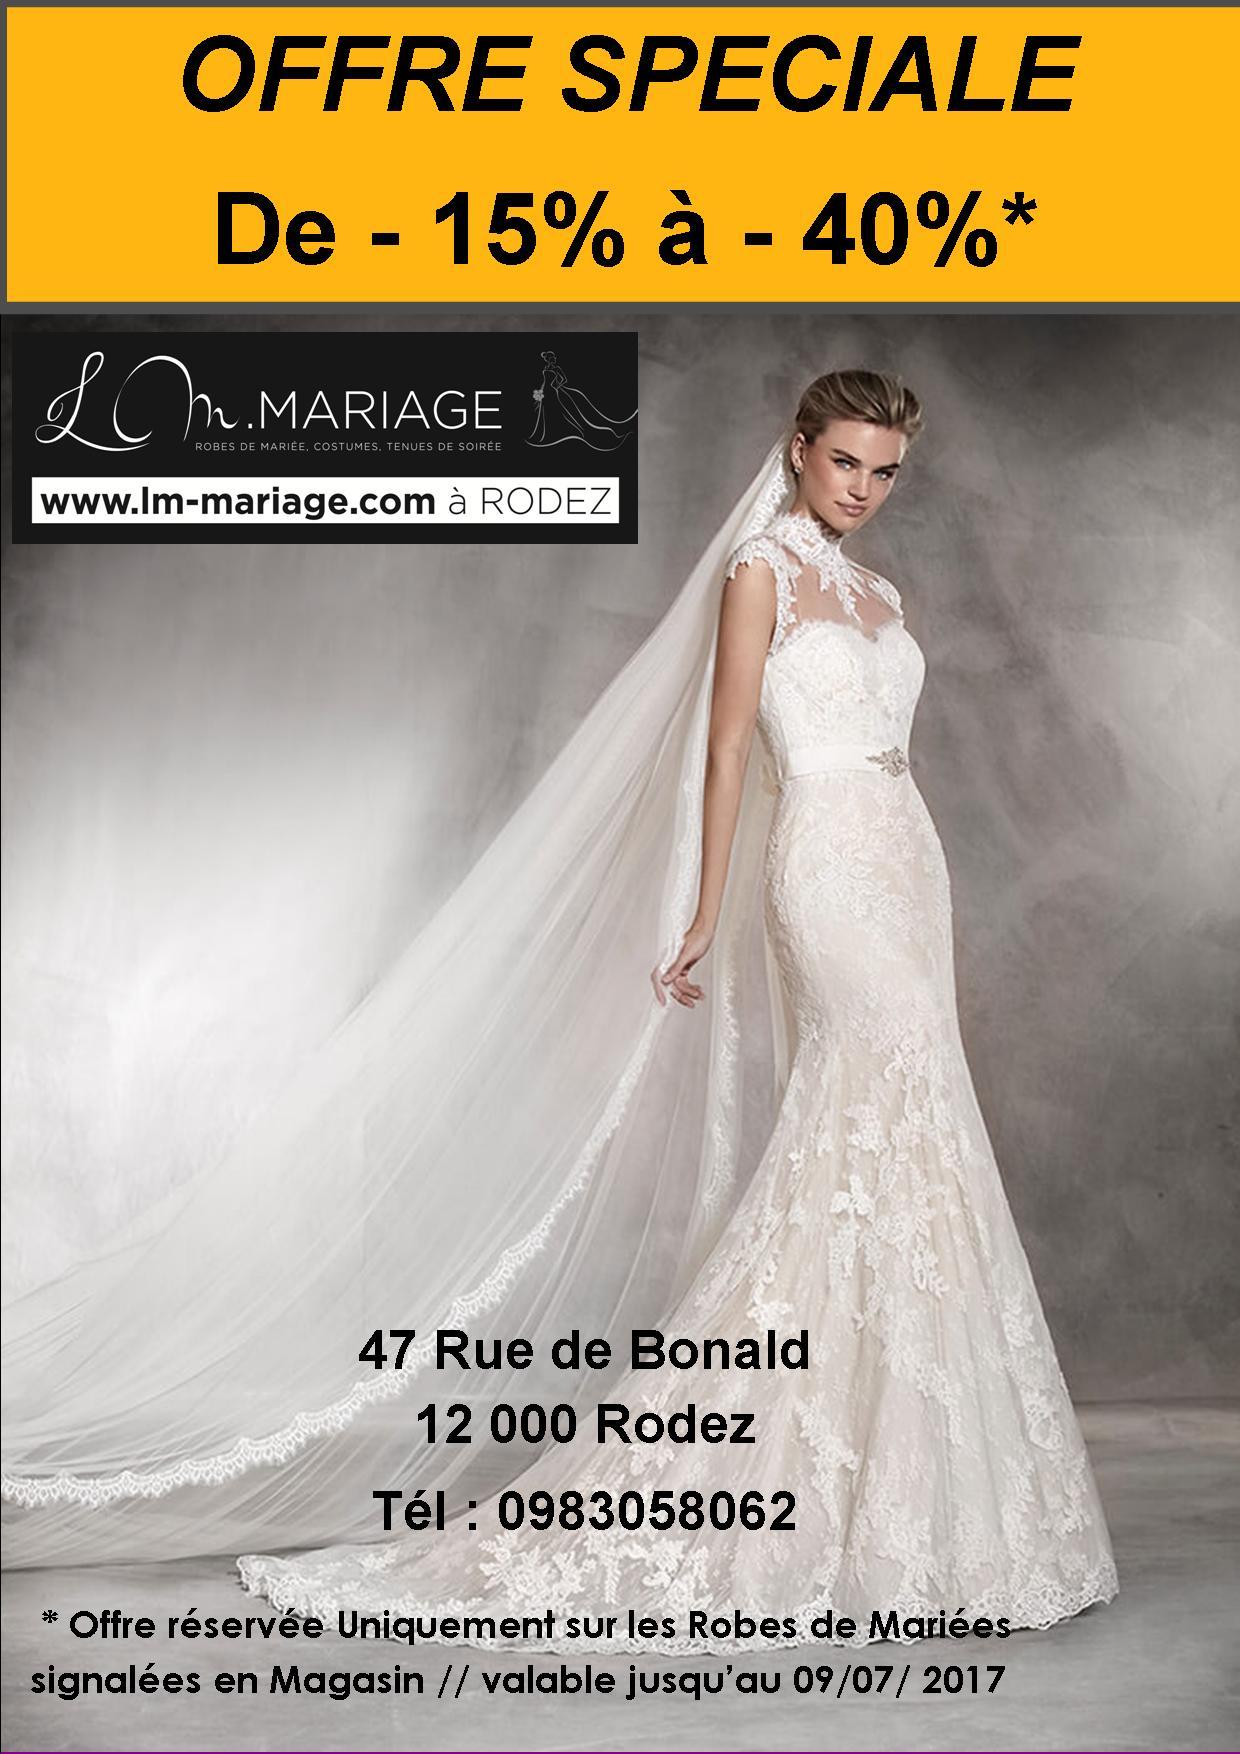 Robes de mariée just for you